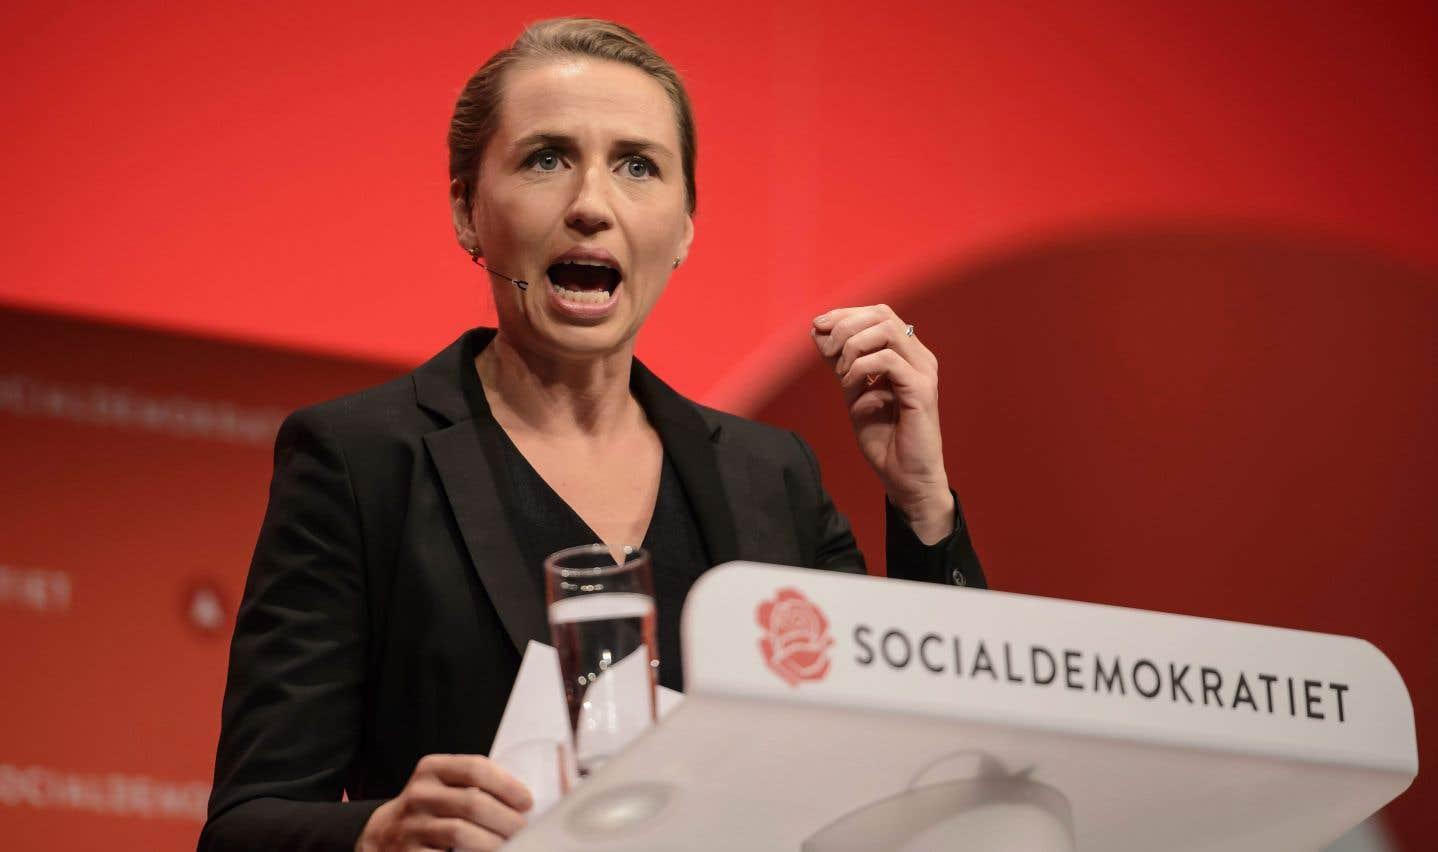 La chef de Socialdemokratiet, Mette Frederiksen